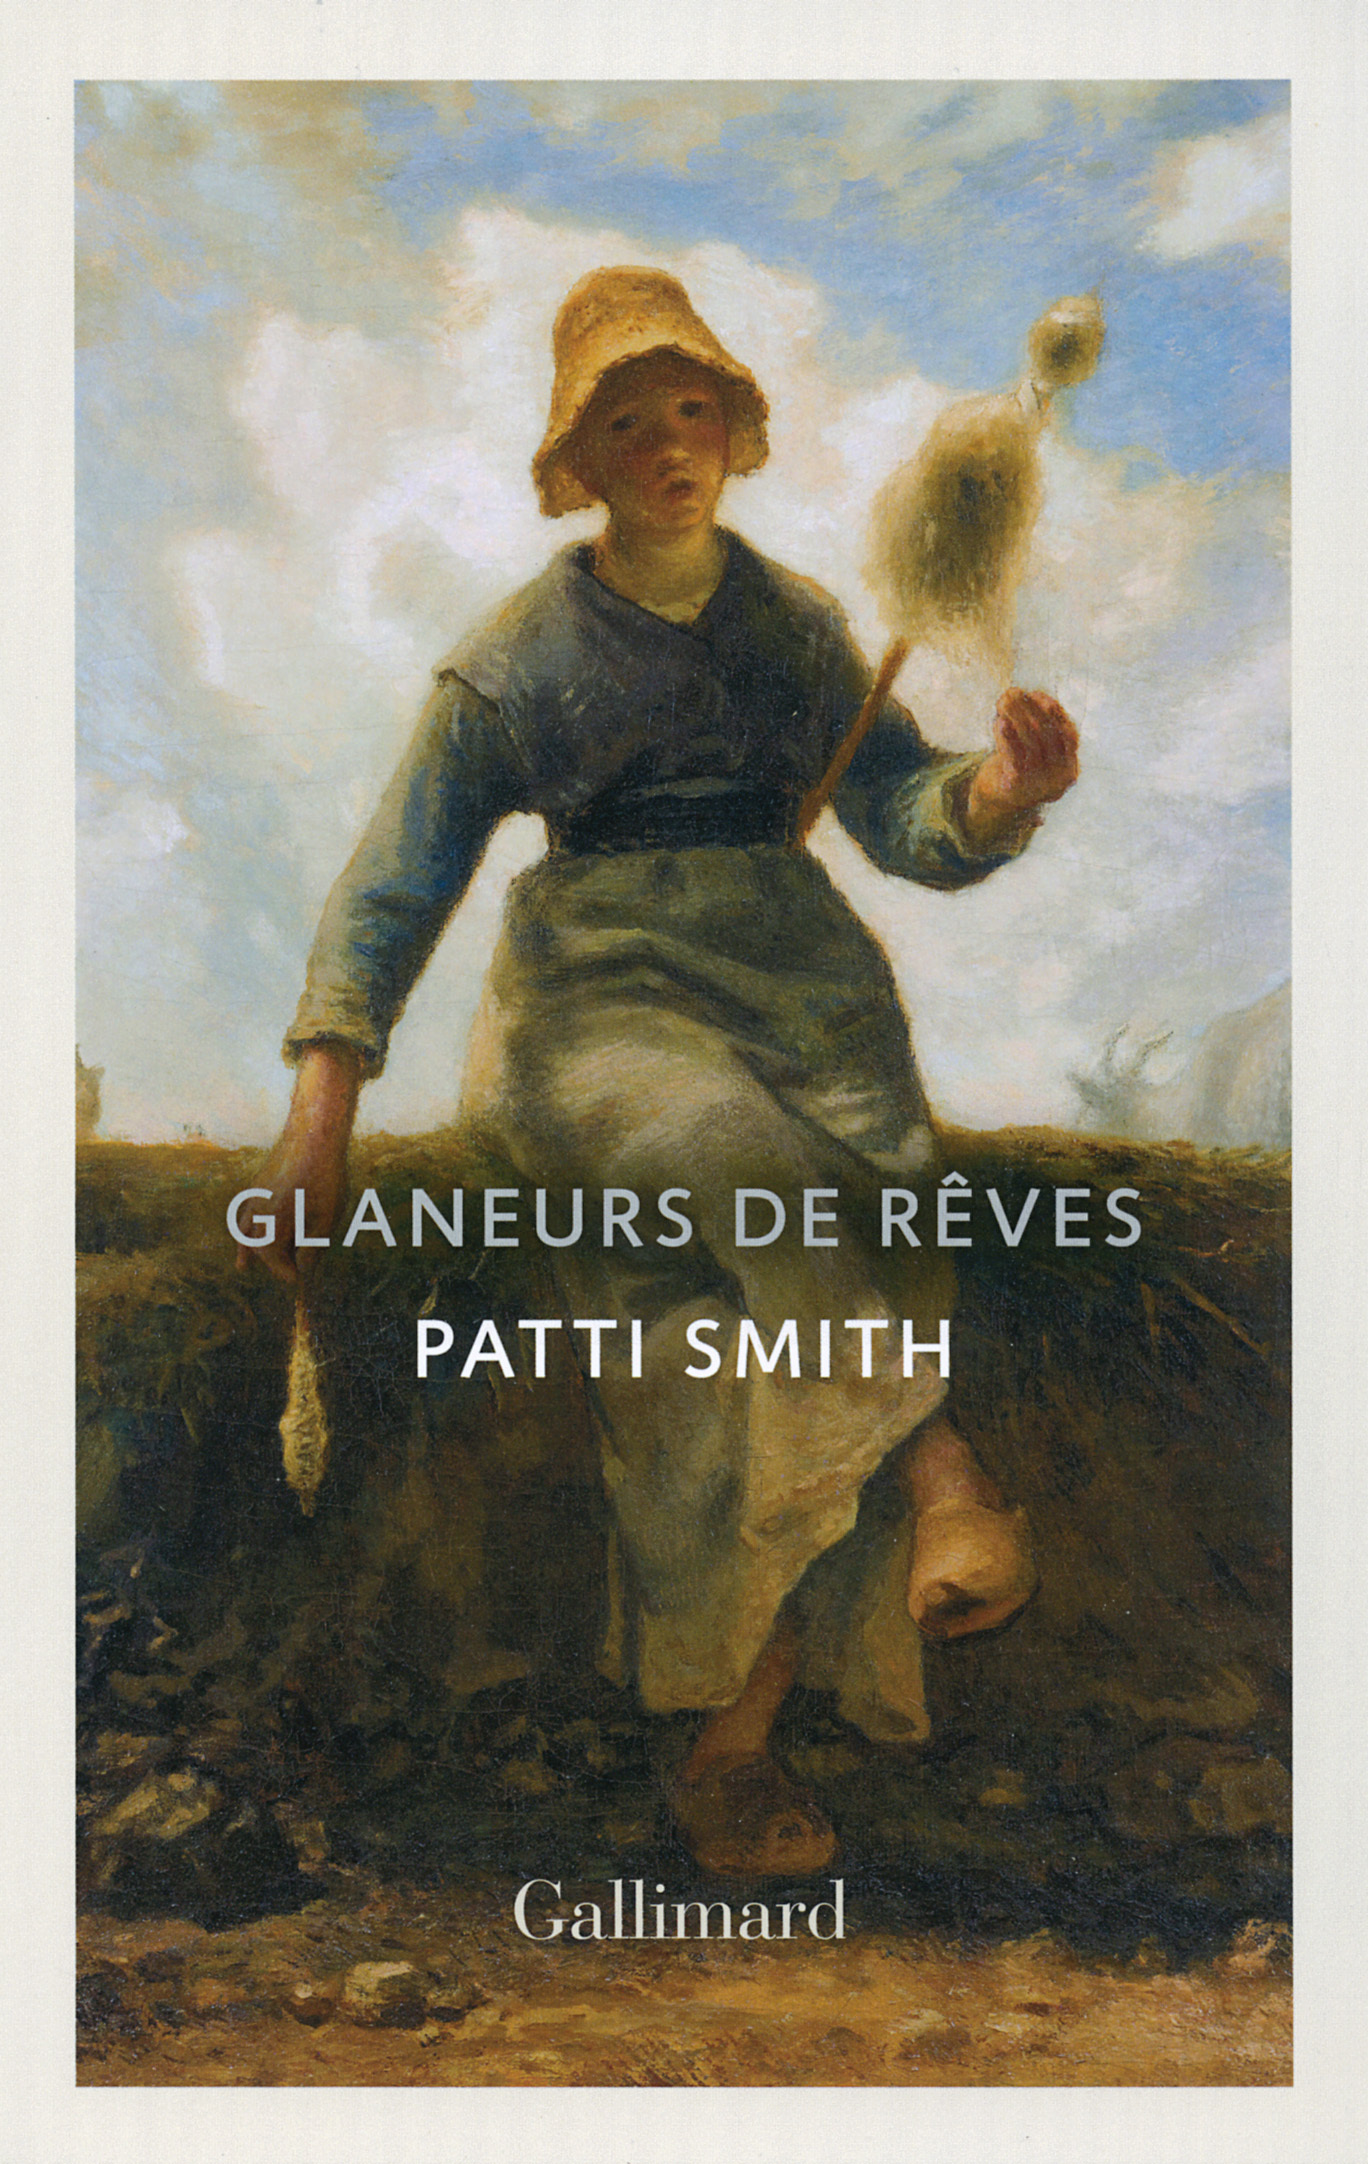 GLANEURS DE REVES